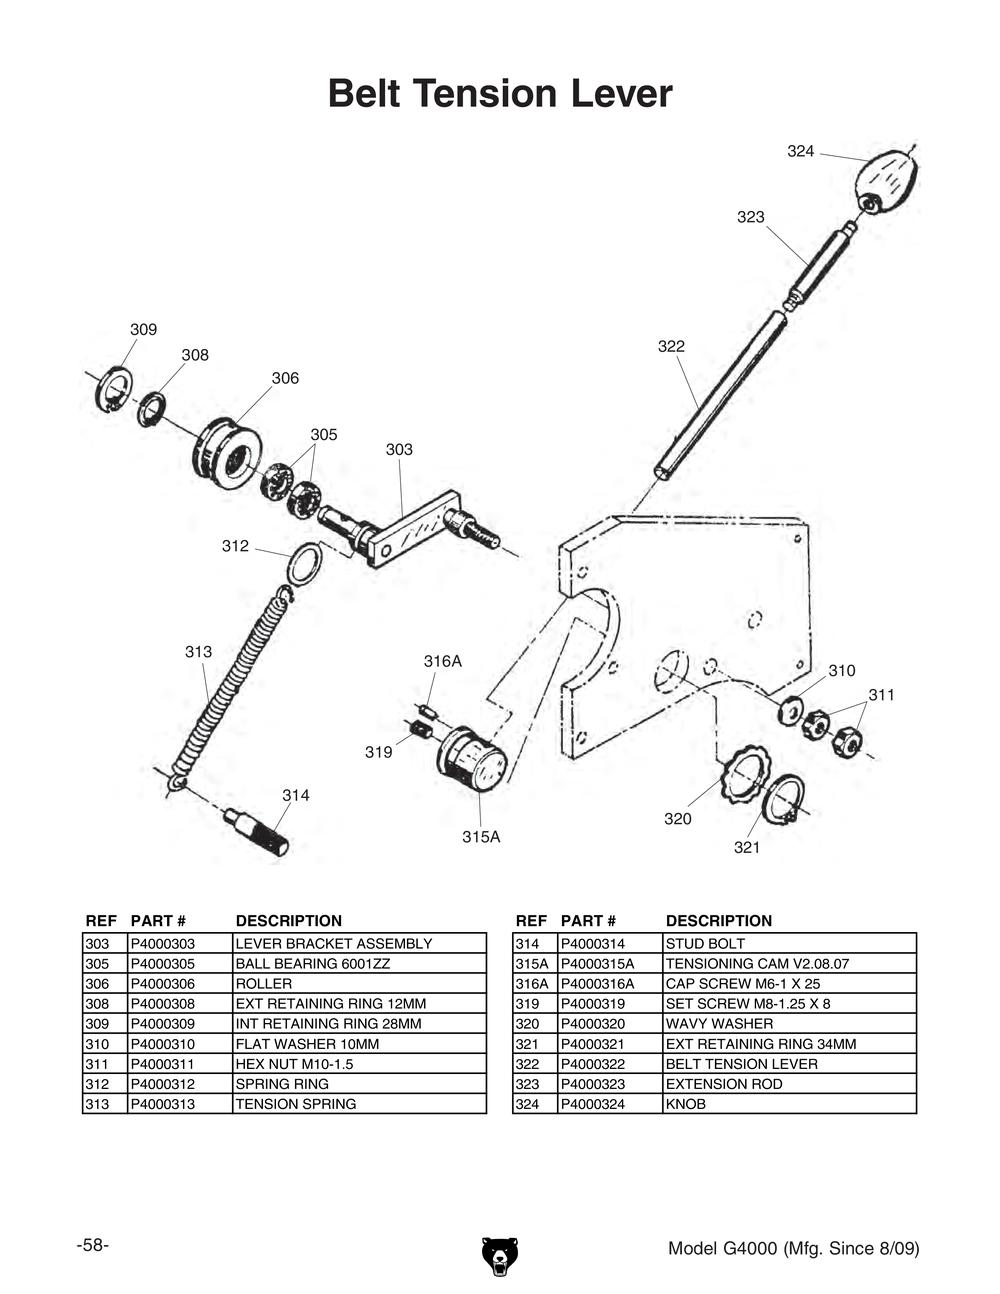 Sears Craftsman 12 Inch Wood Lathe Manual Engine Parts Diagram